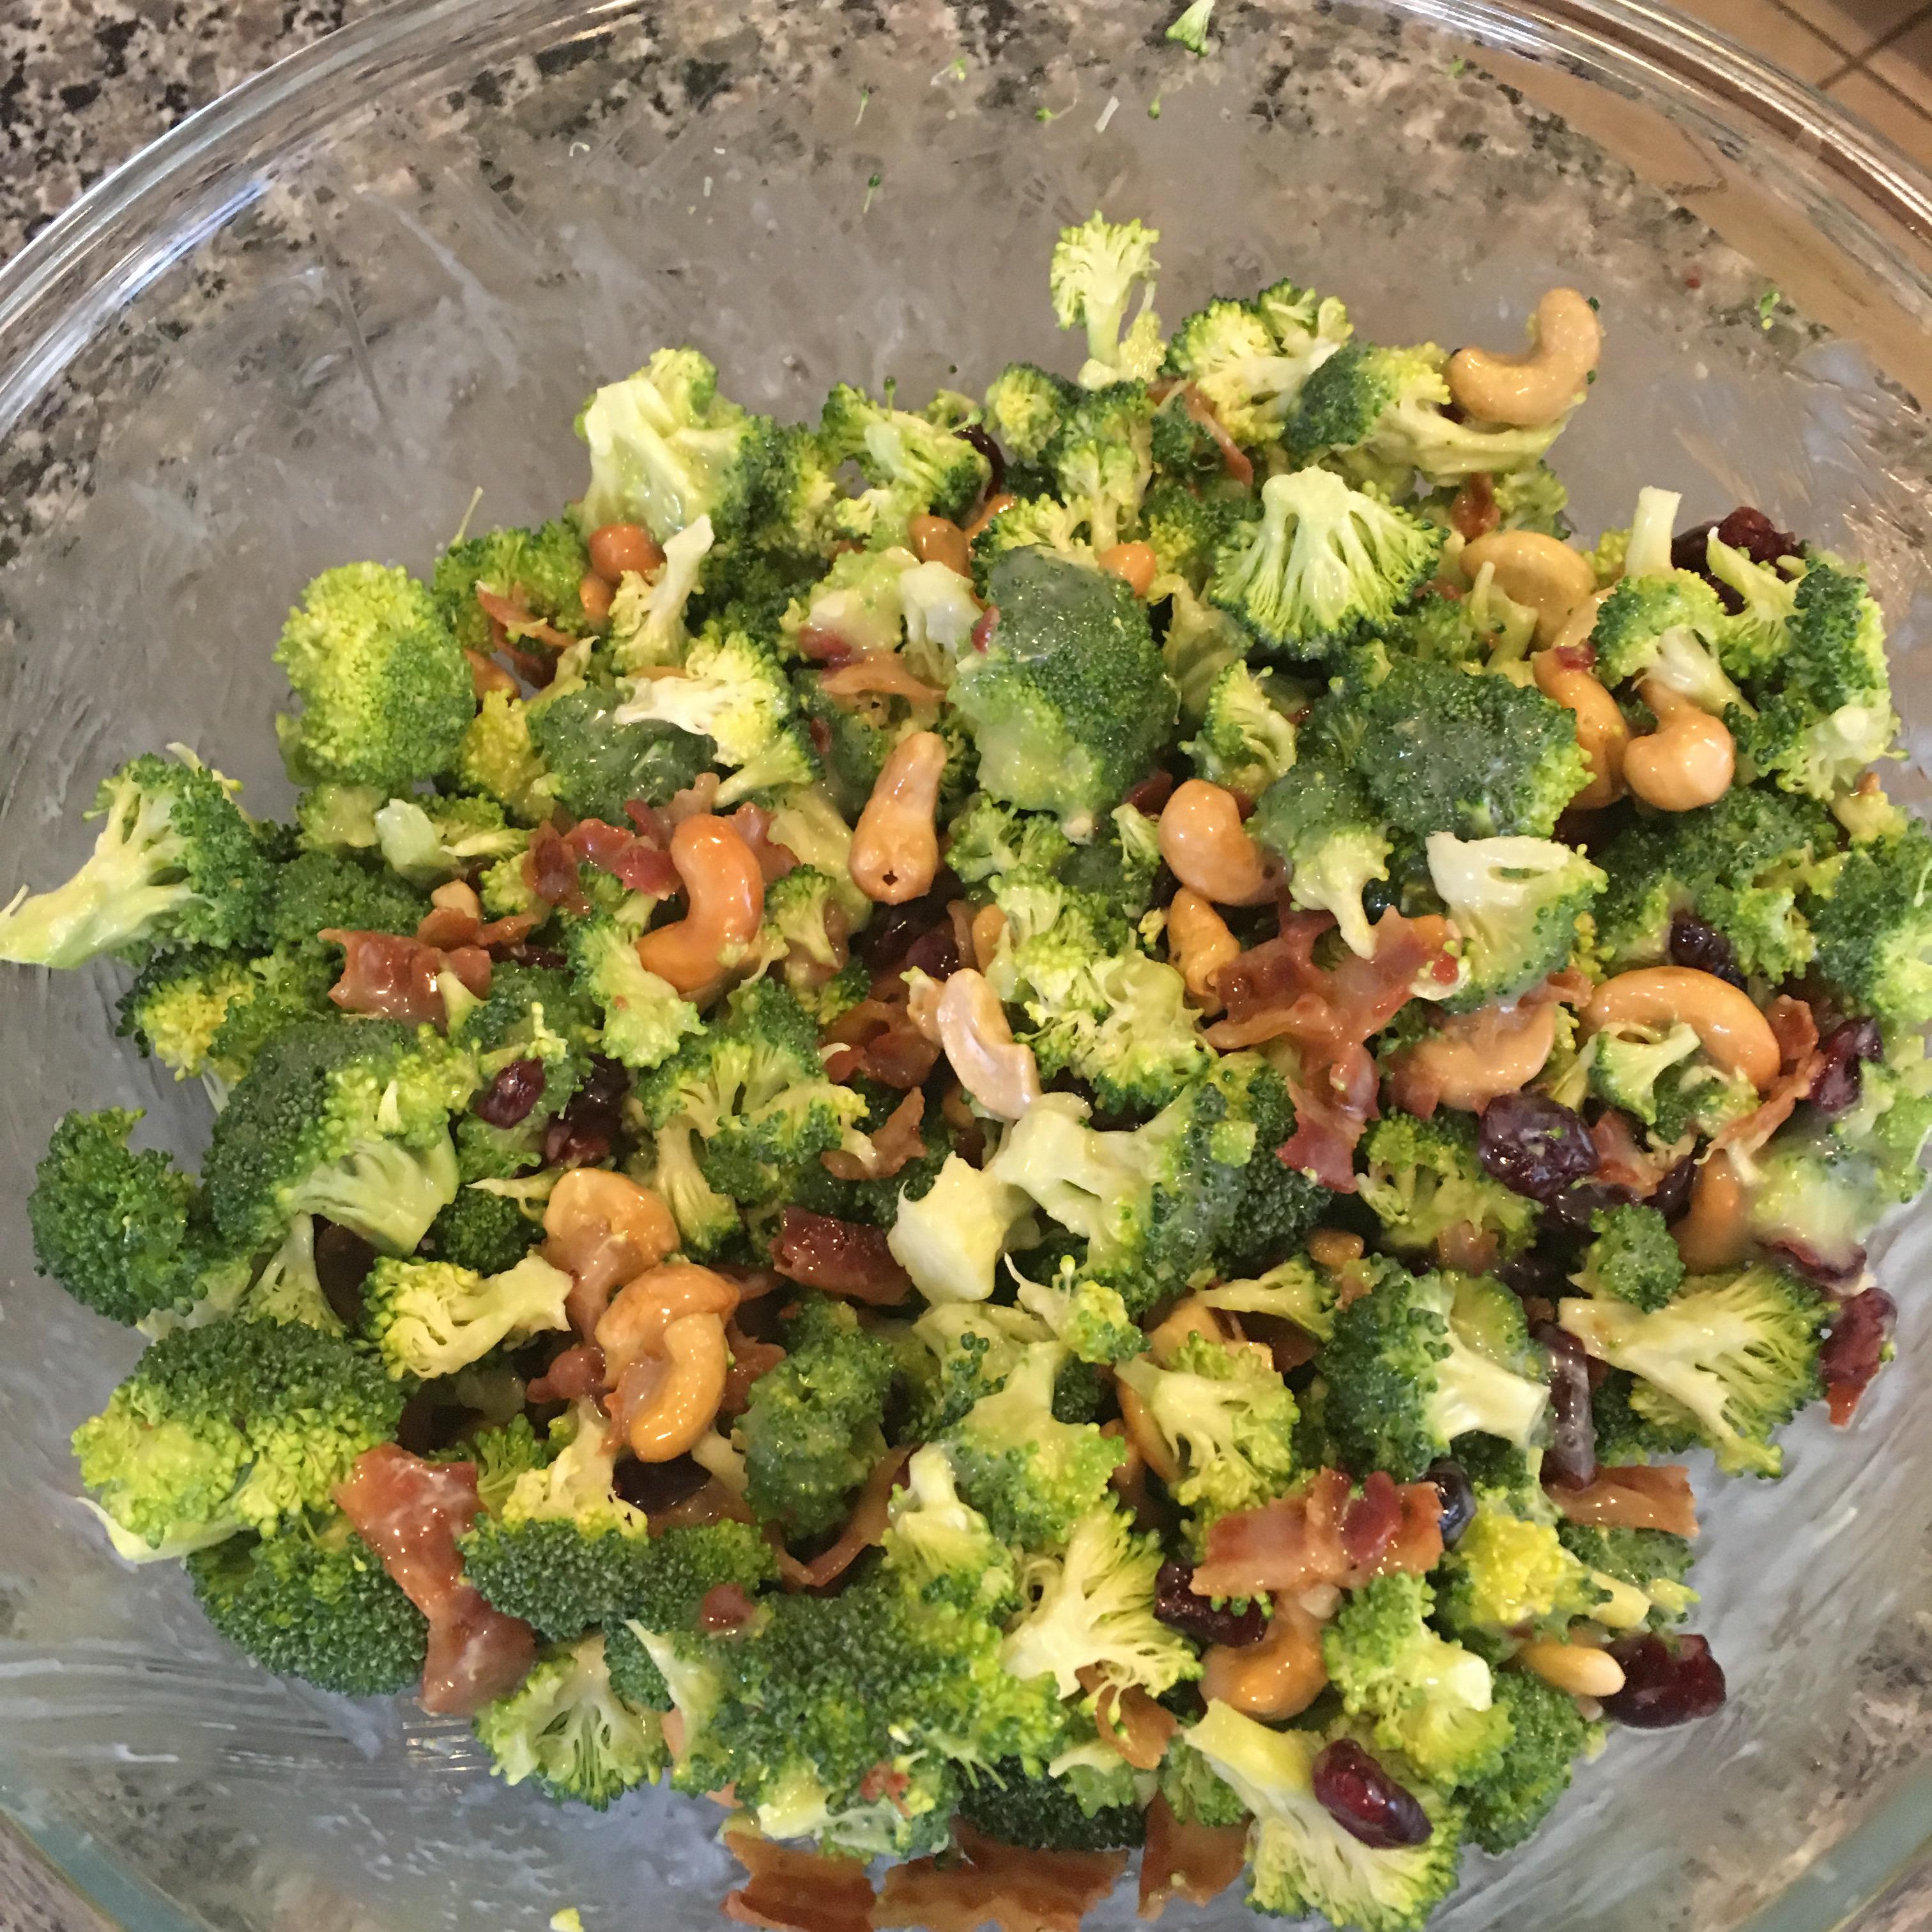 Broccoli Cashew Salad julie